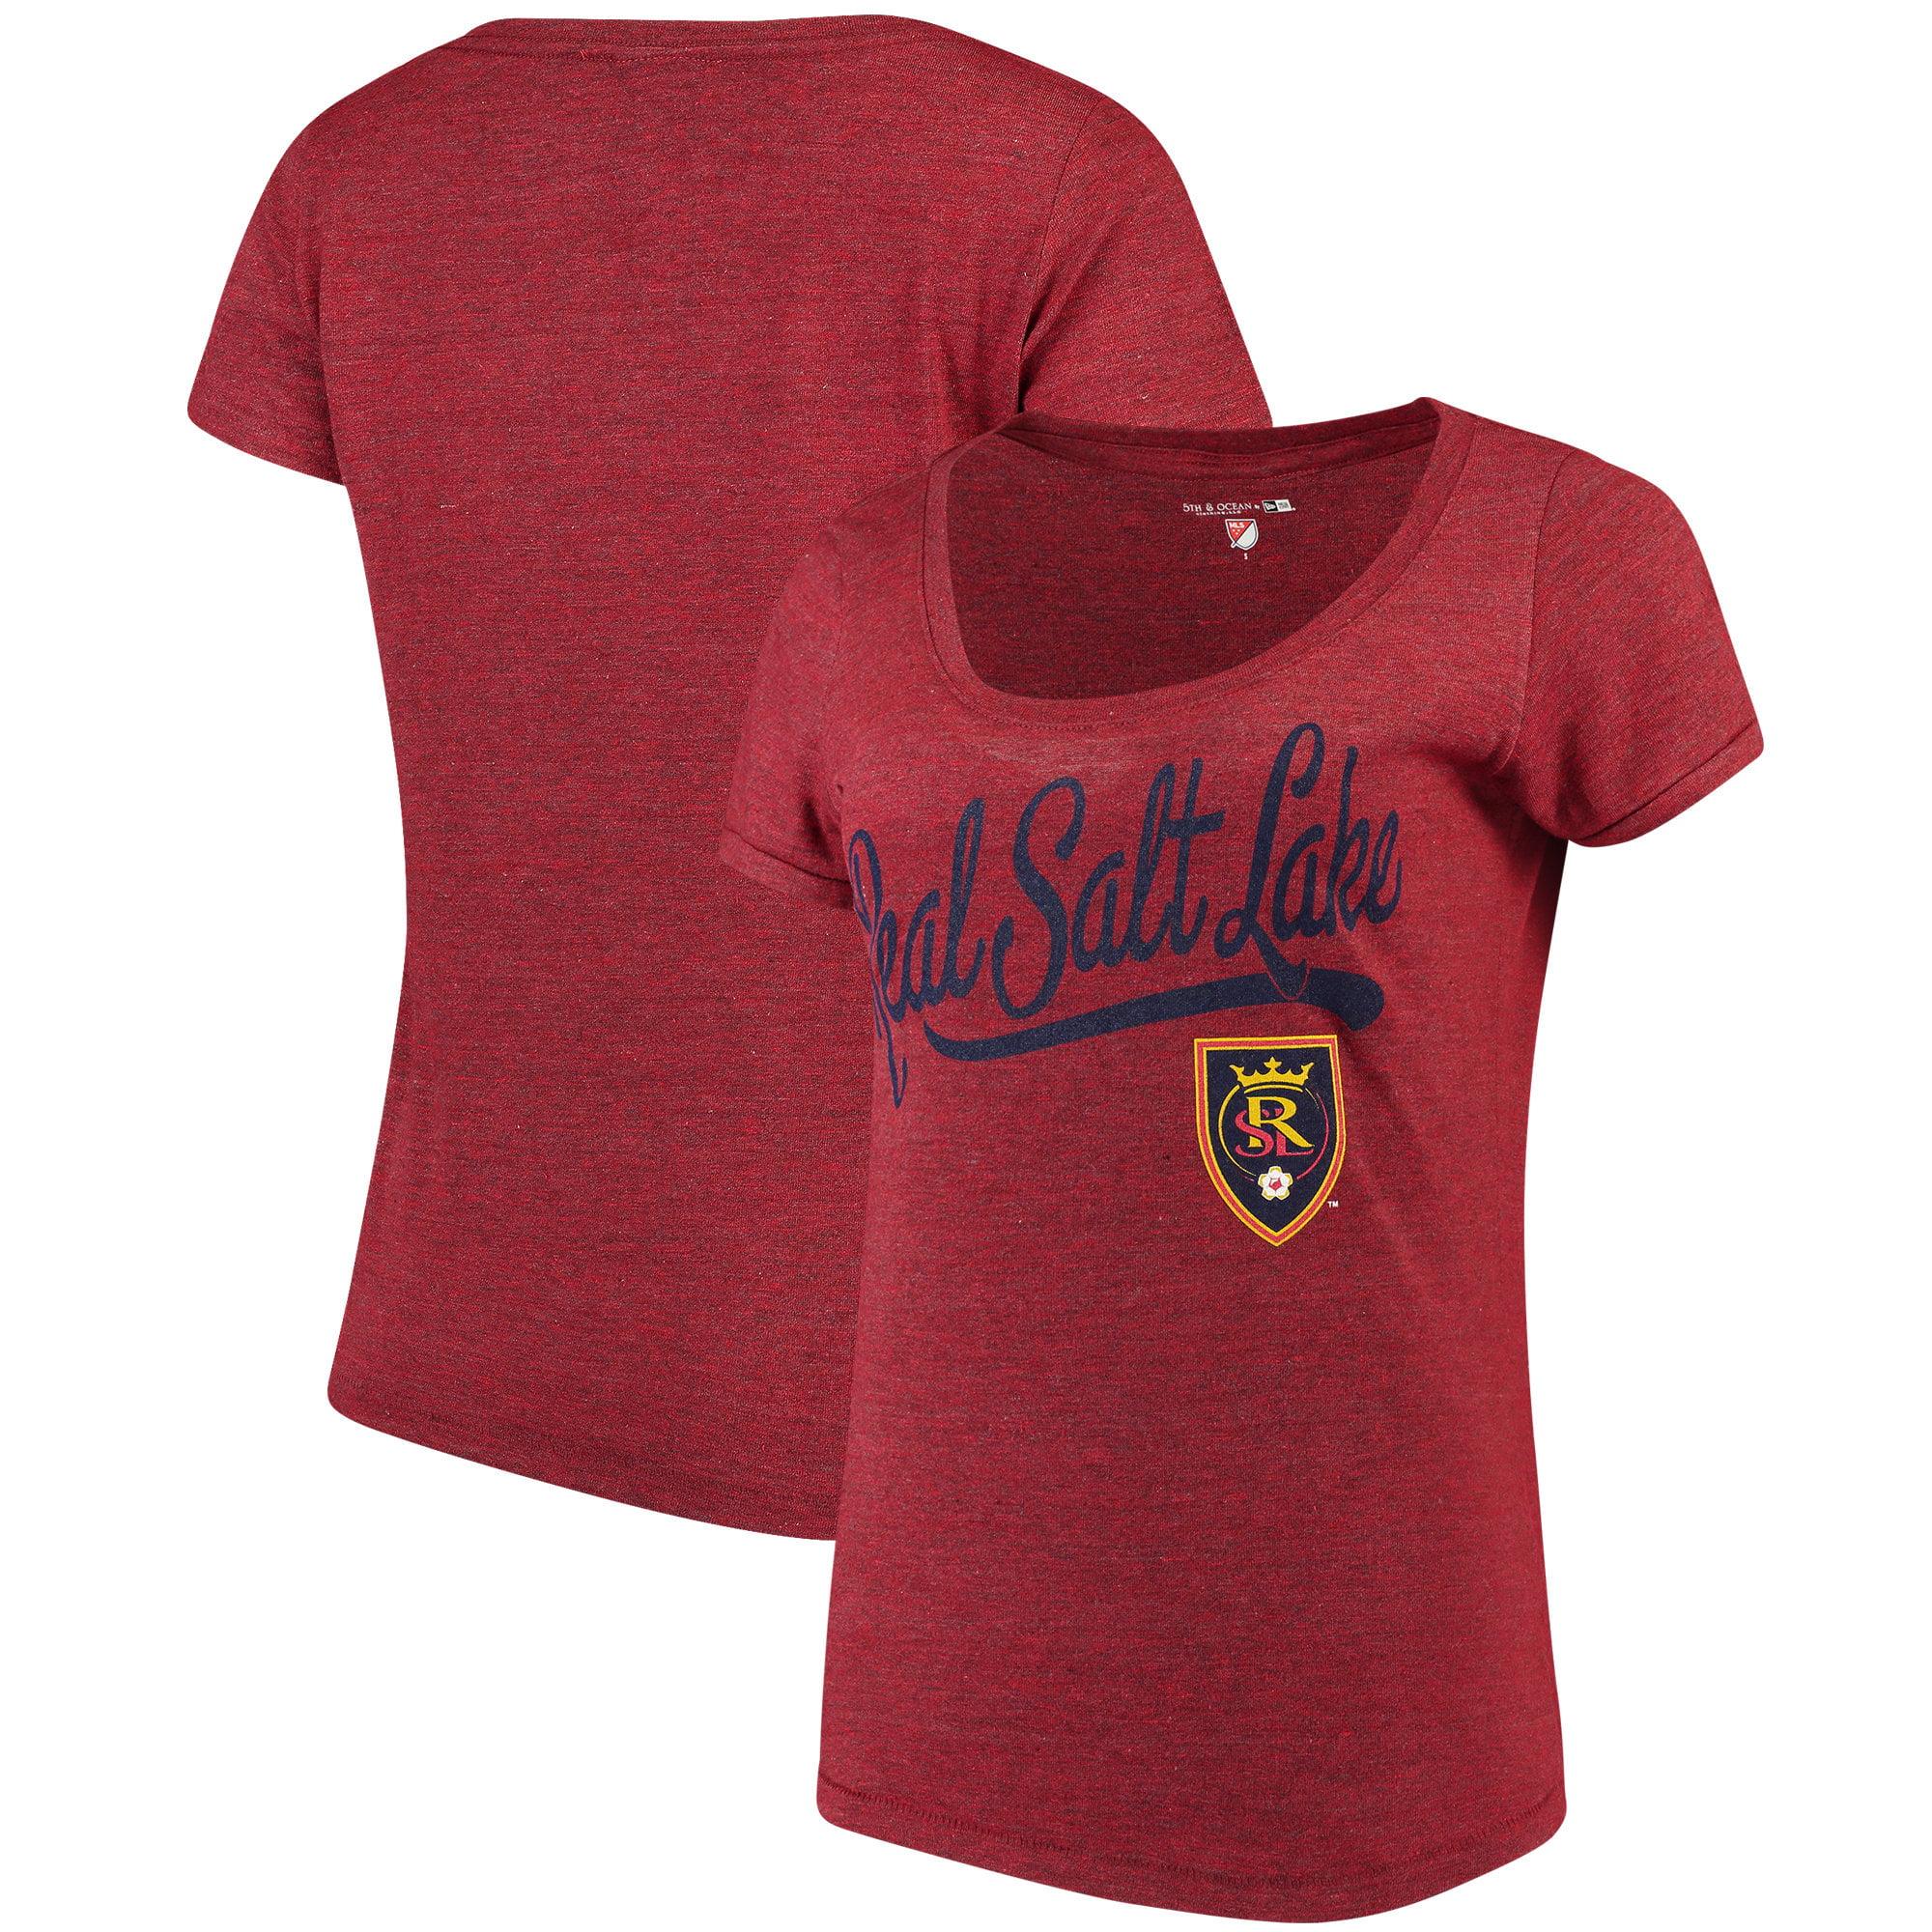 Real Salt Lake 5th & Ocean by New Era Women's Scoop Neck Tri-Blend T-Shirt - Red